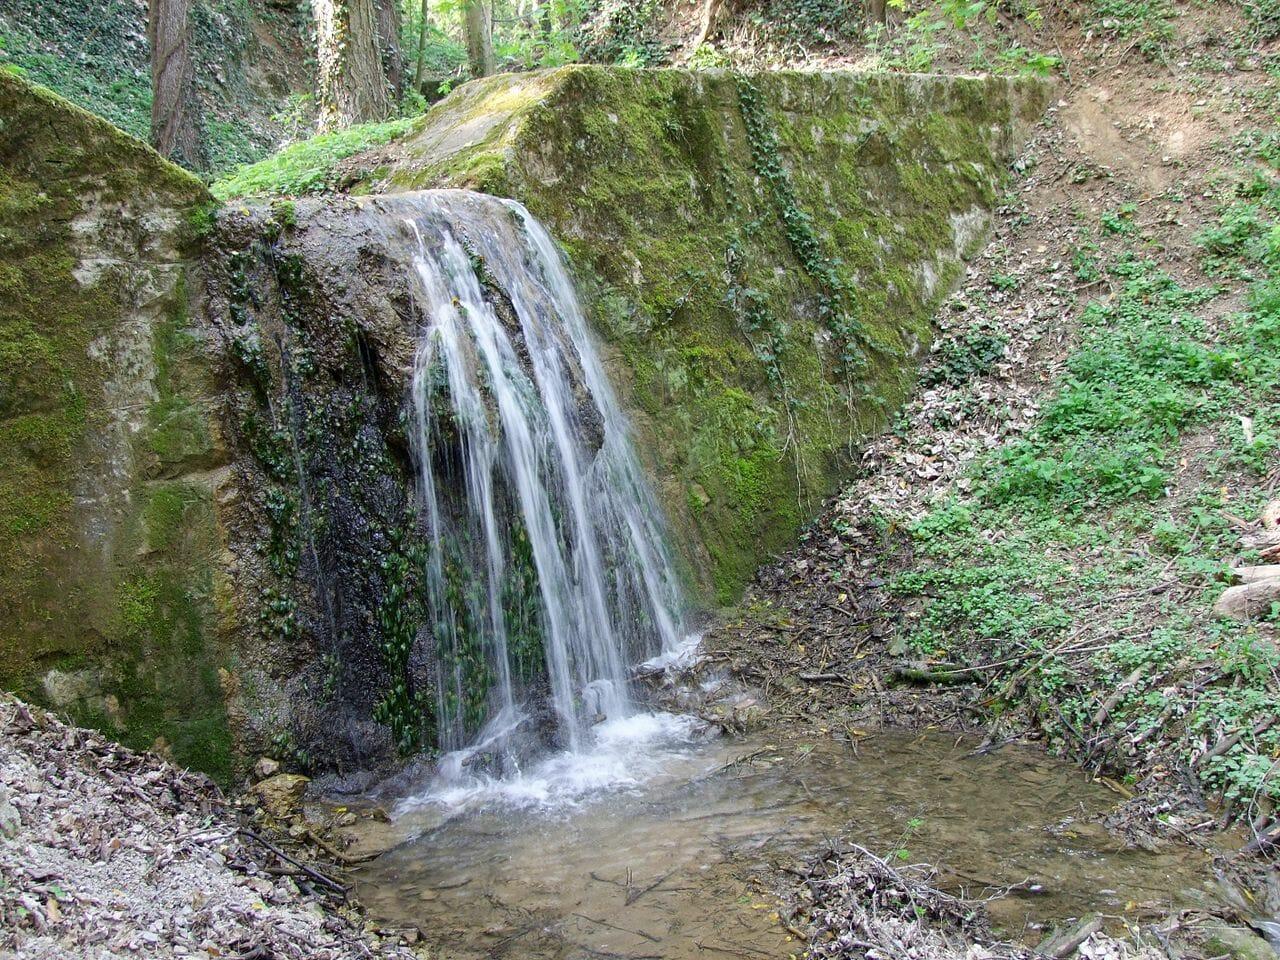 Vodopád Haluzická tiesňava